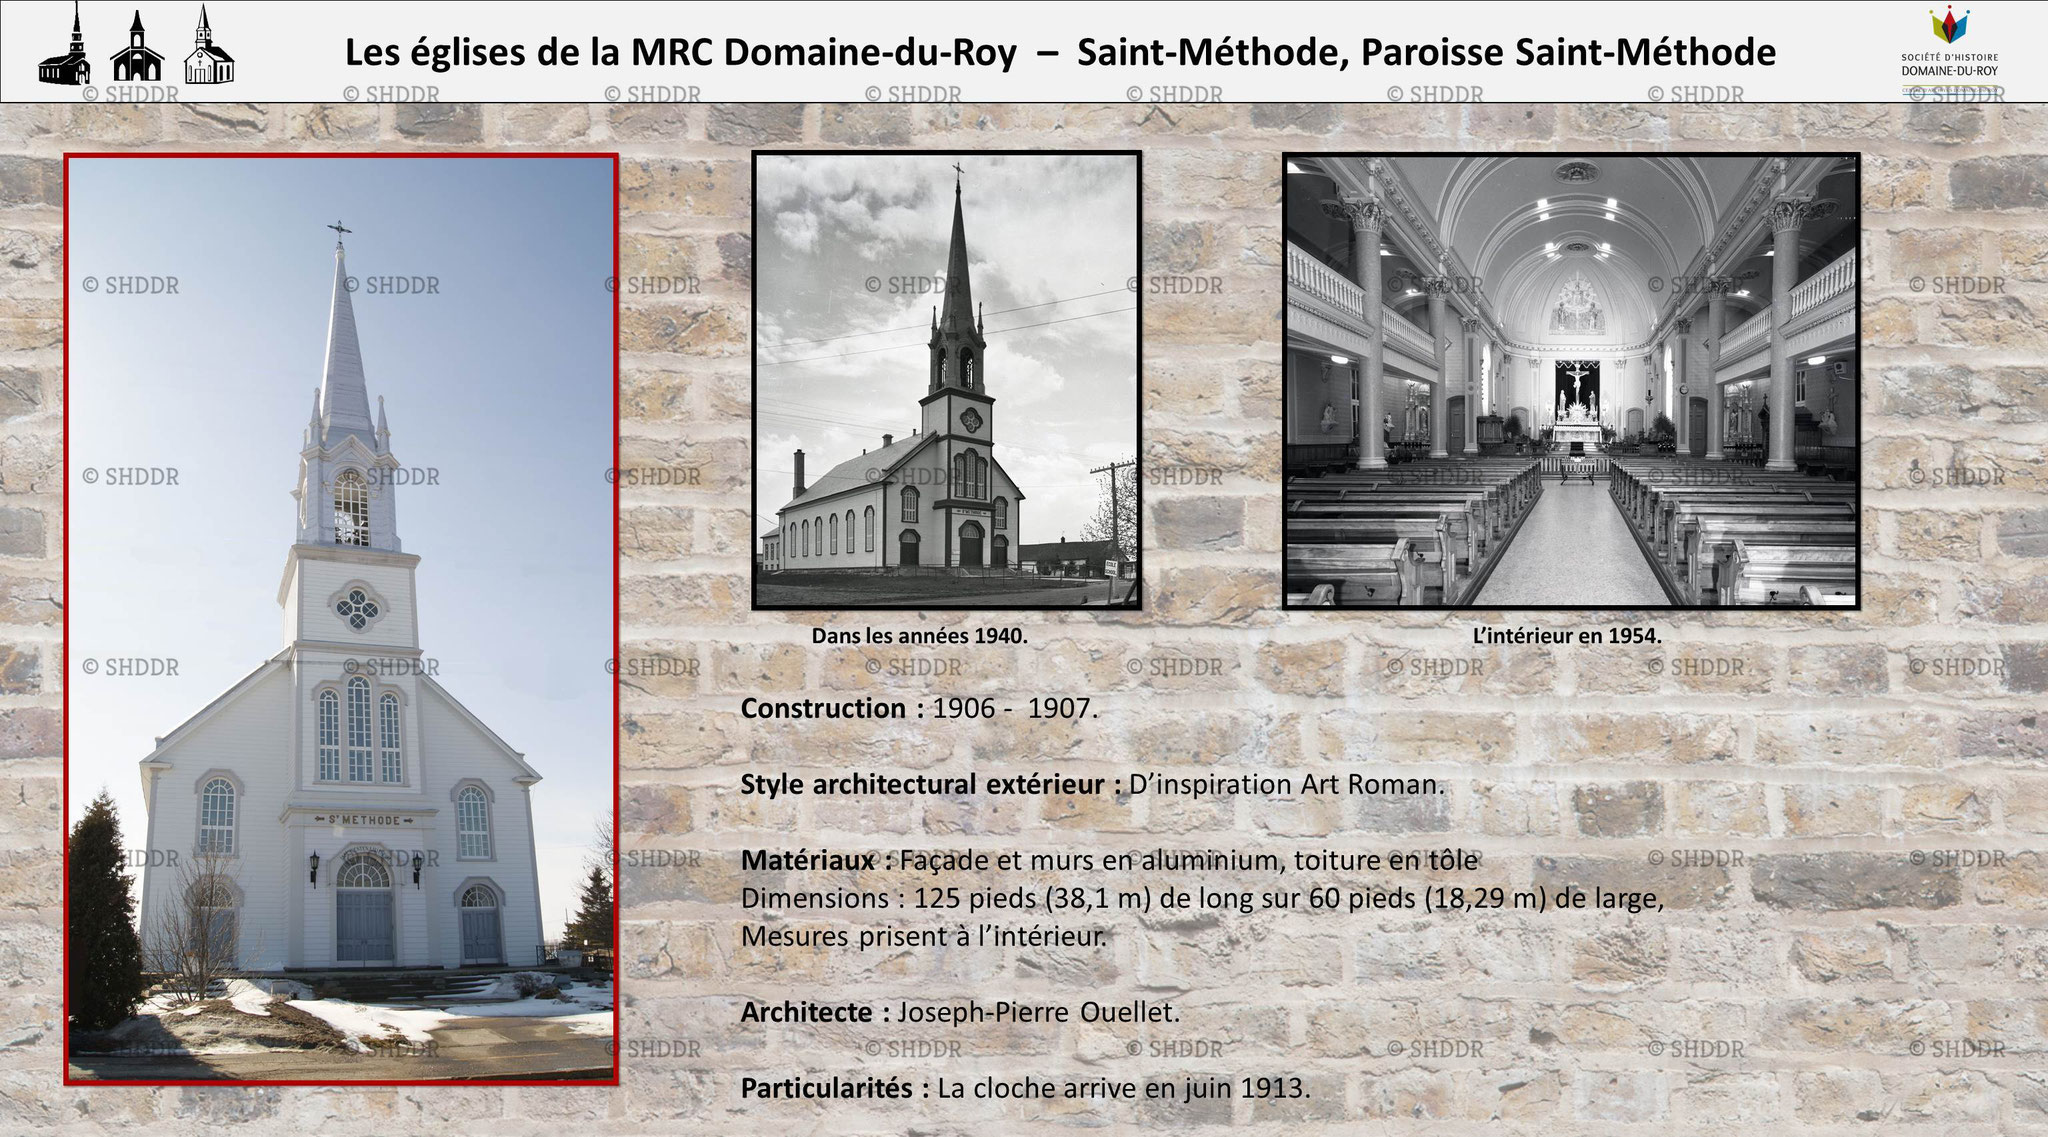 Saint-Méthode - Église Saint-Méthode